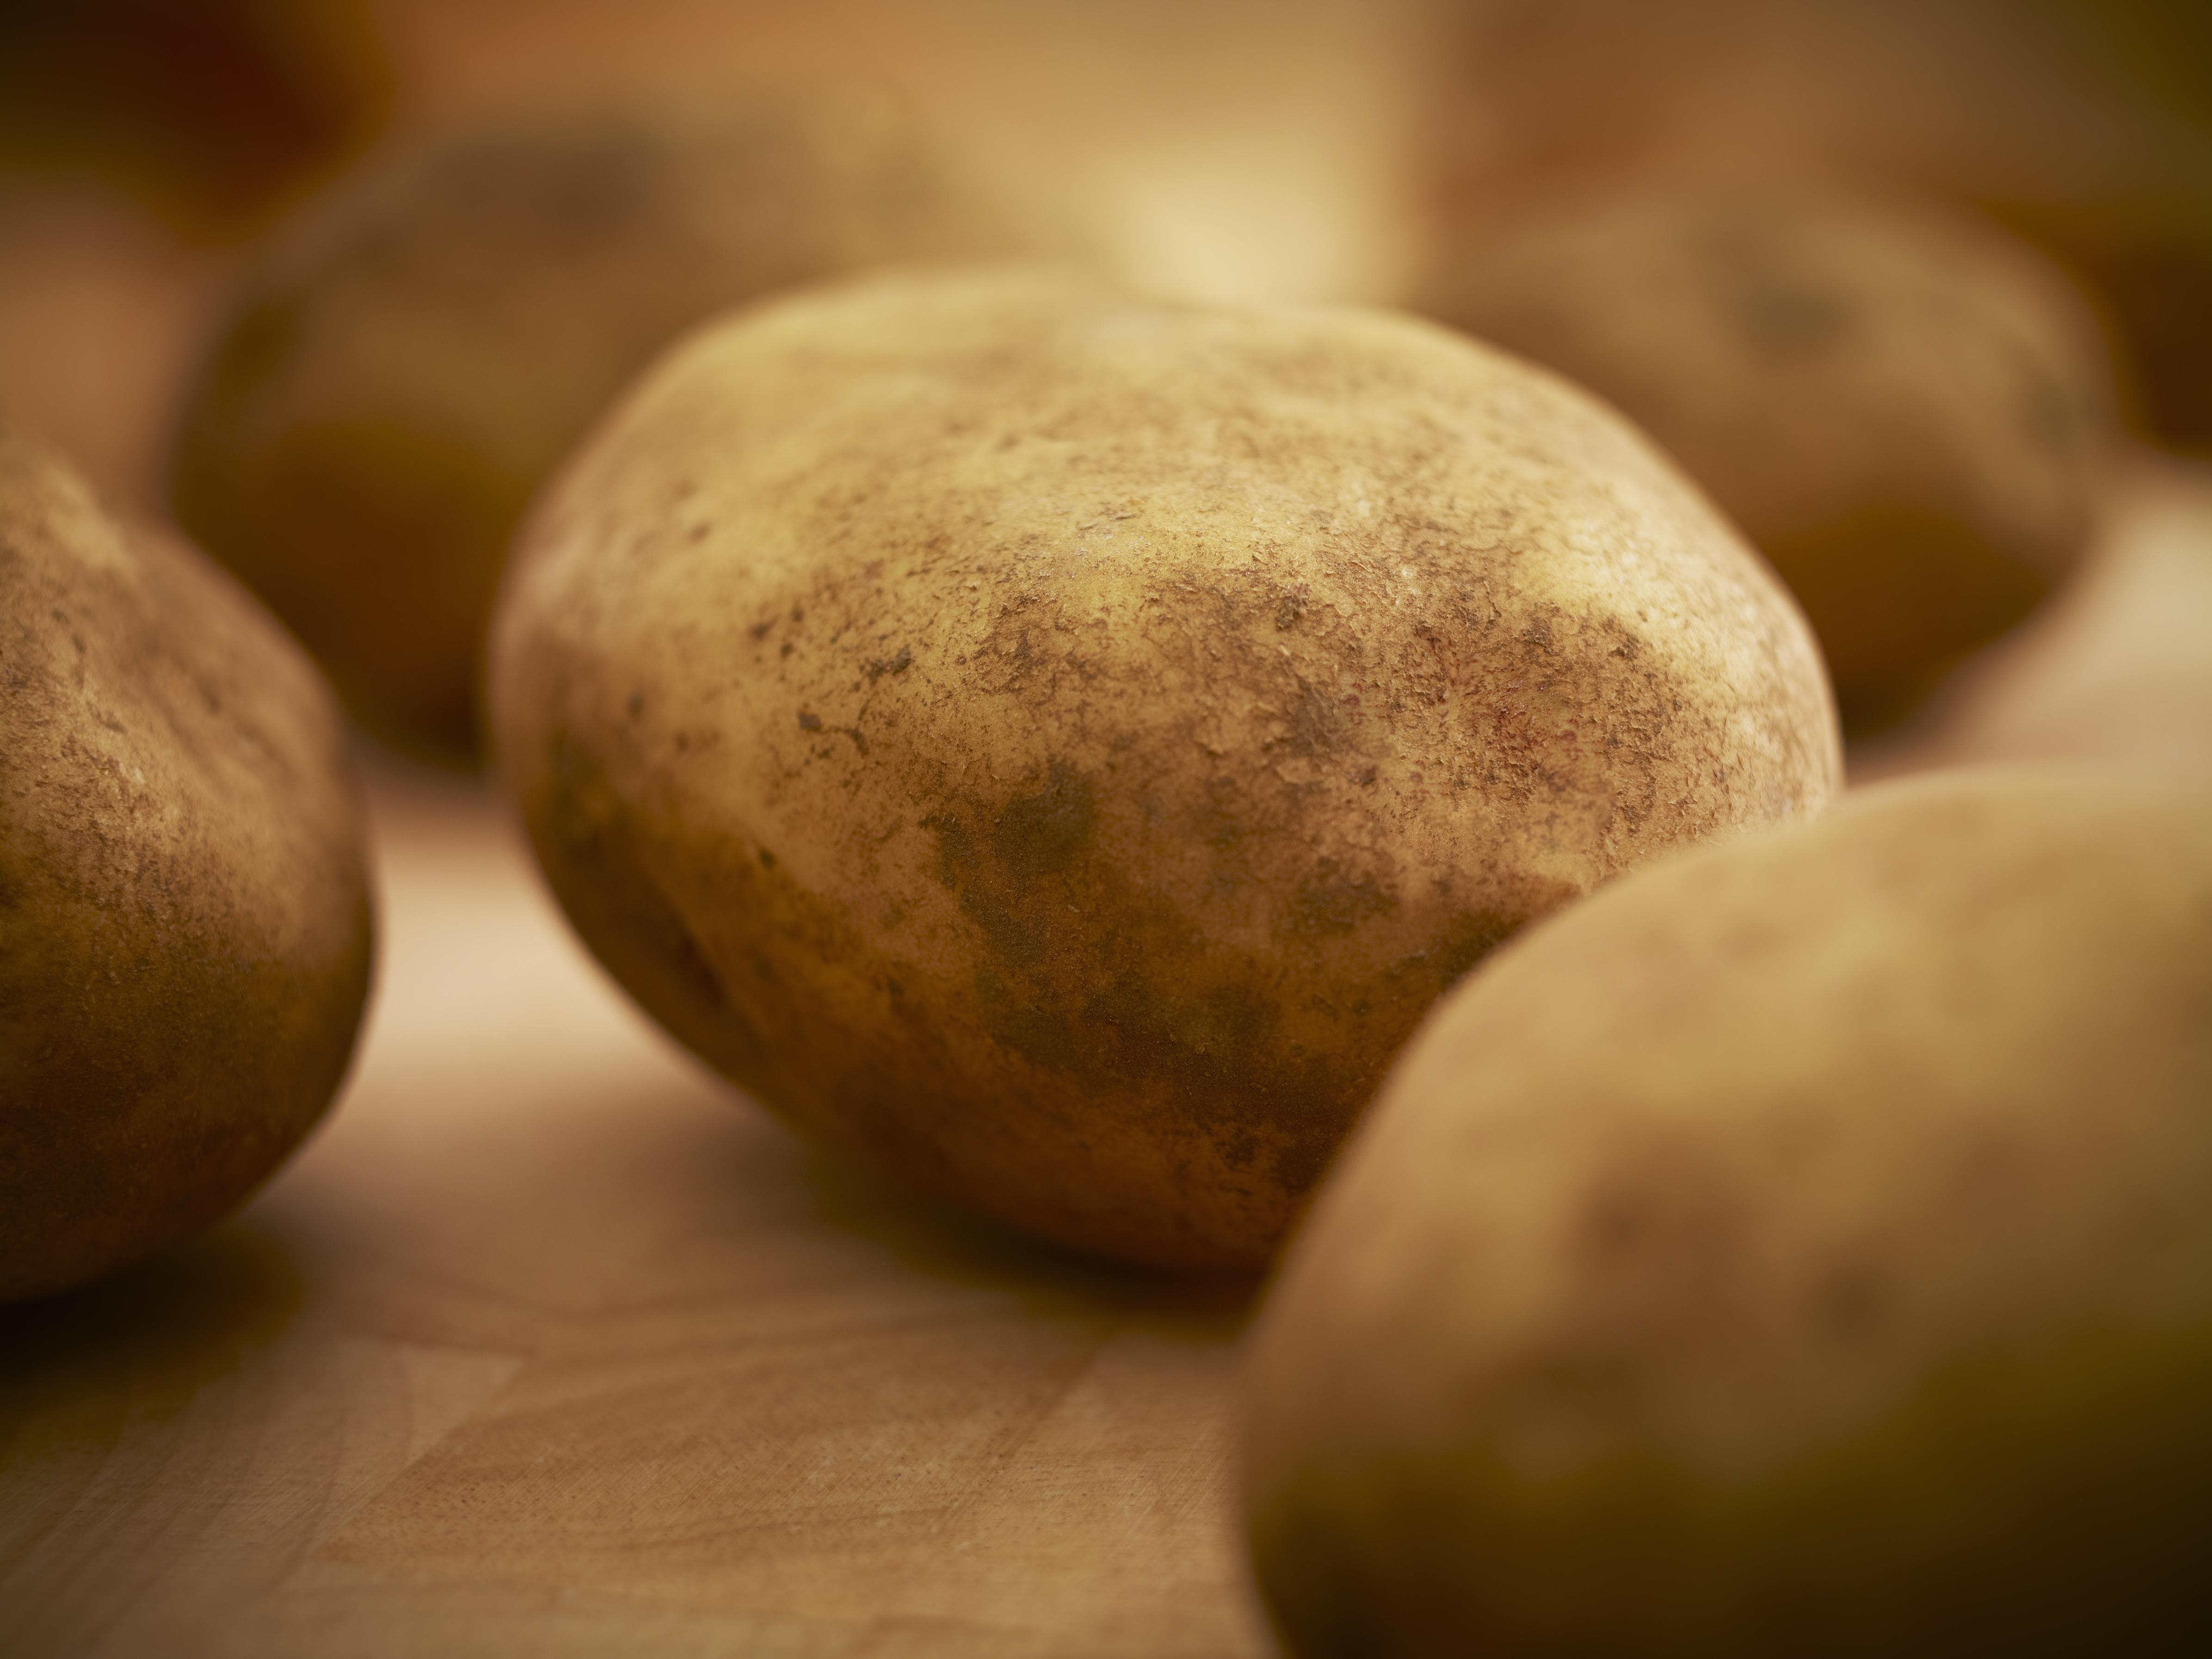 Close up of organic potatoes